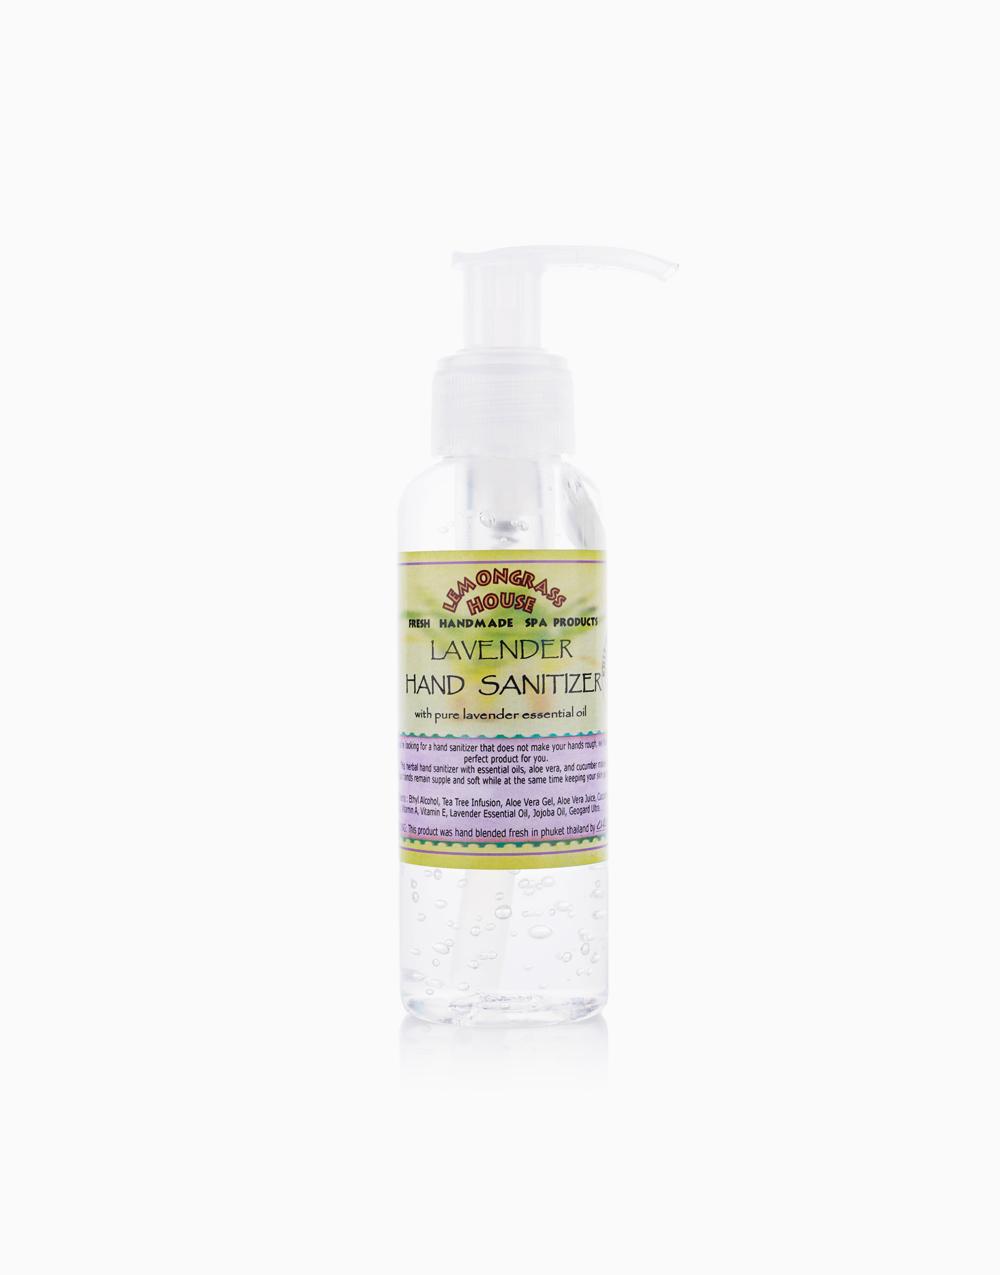 Lavender Hand Moisturizer & Sanitizer 75% Alcohol (120ml) by Lemongrass House